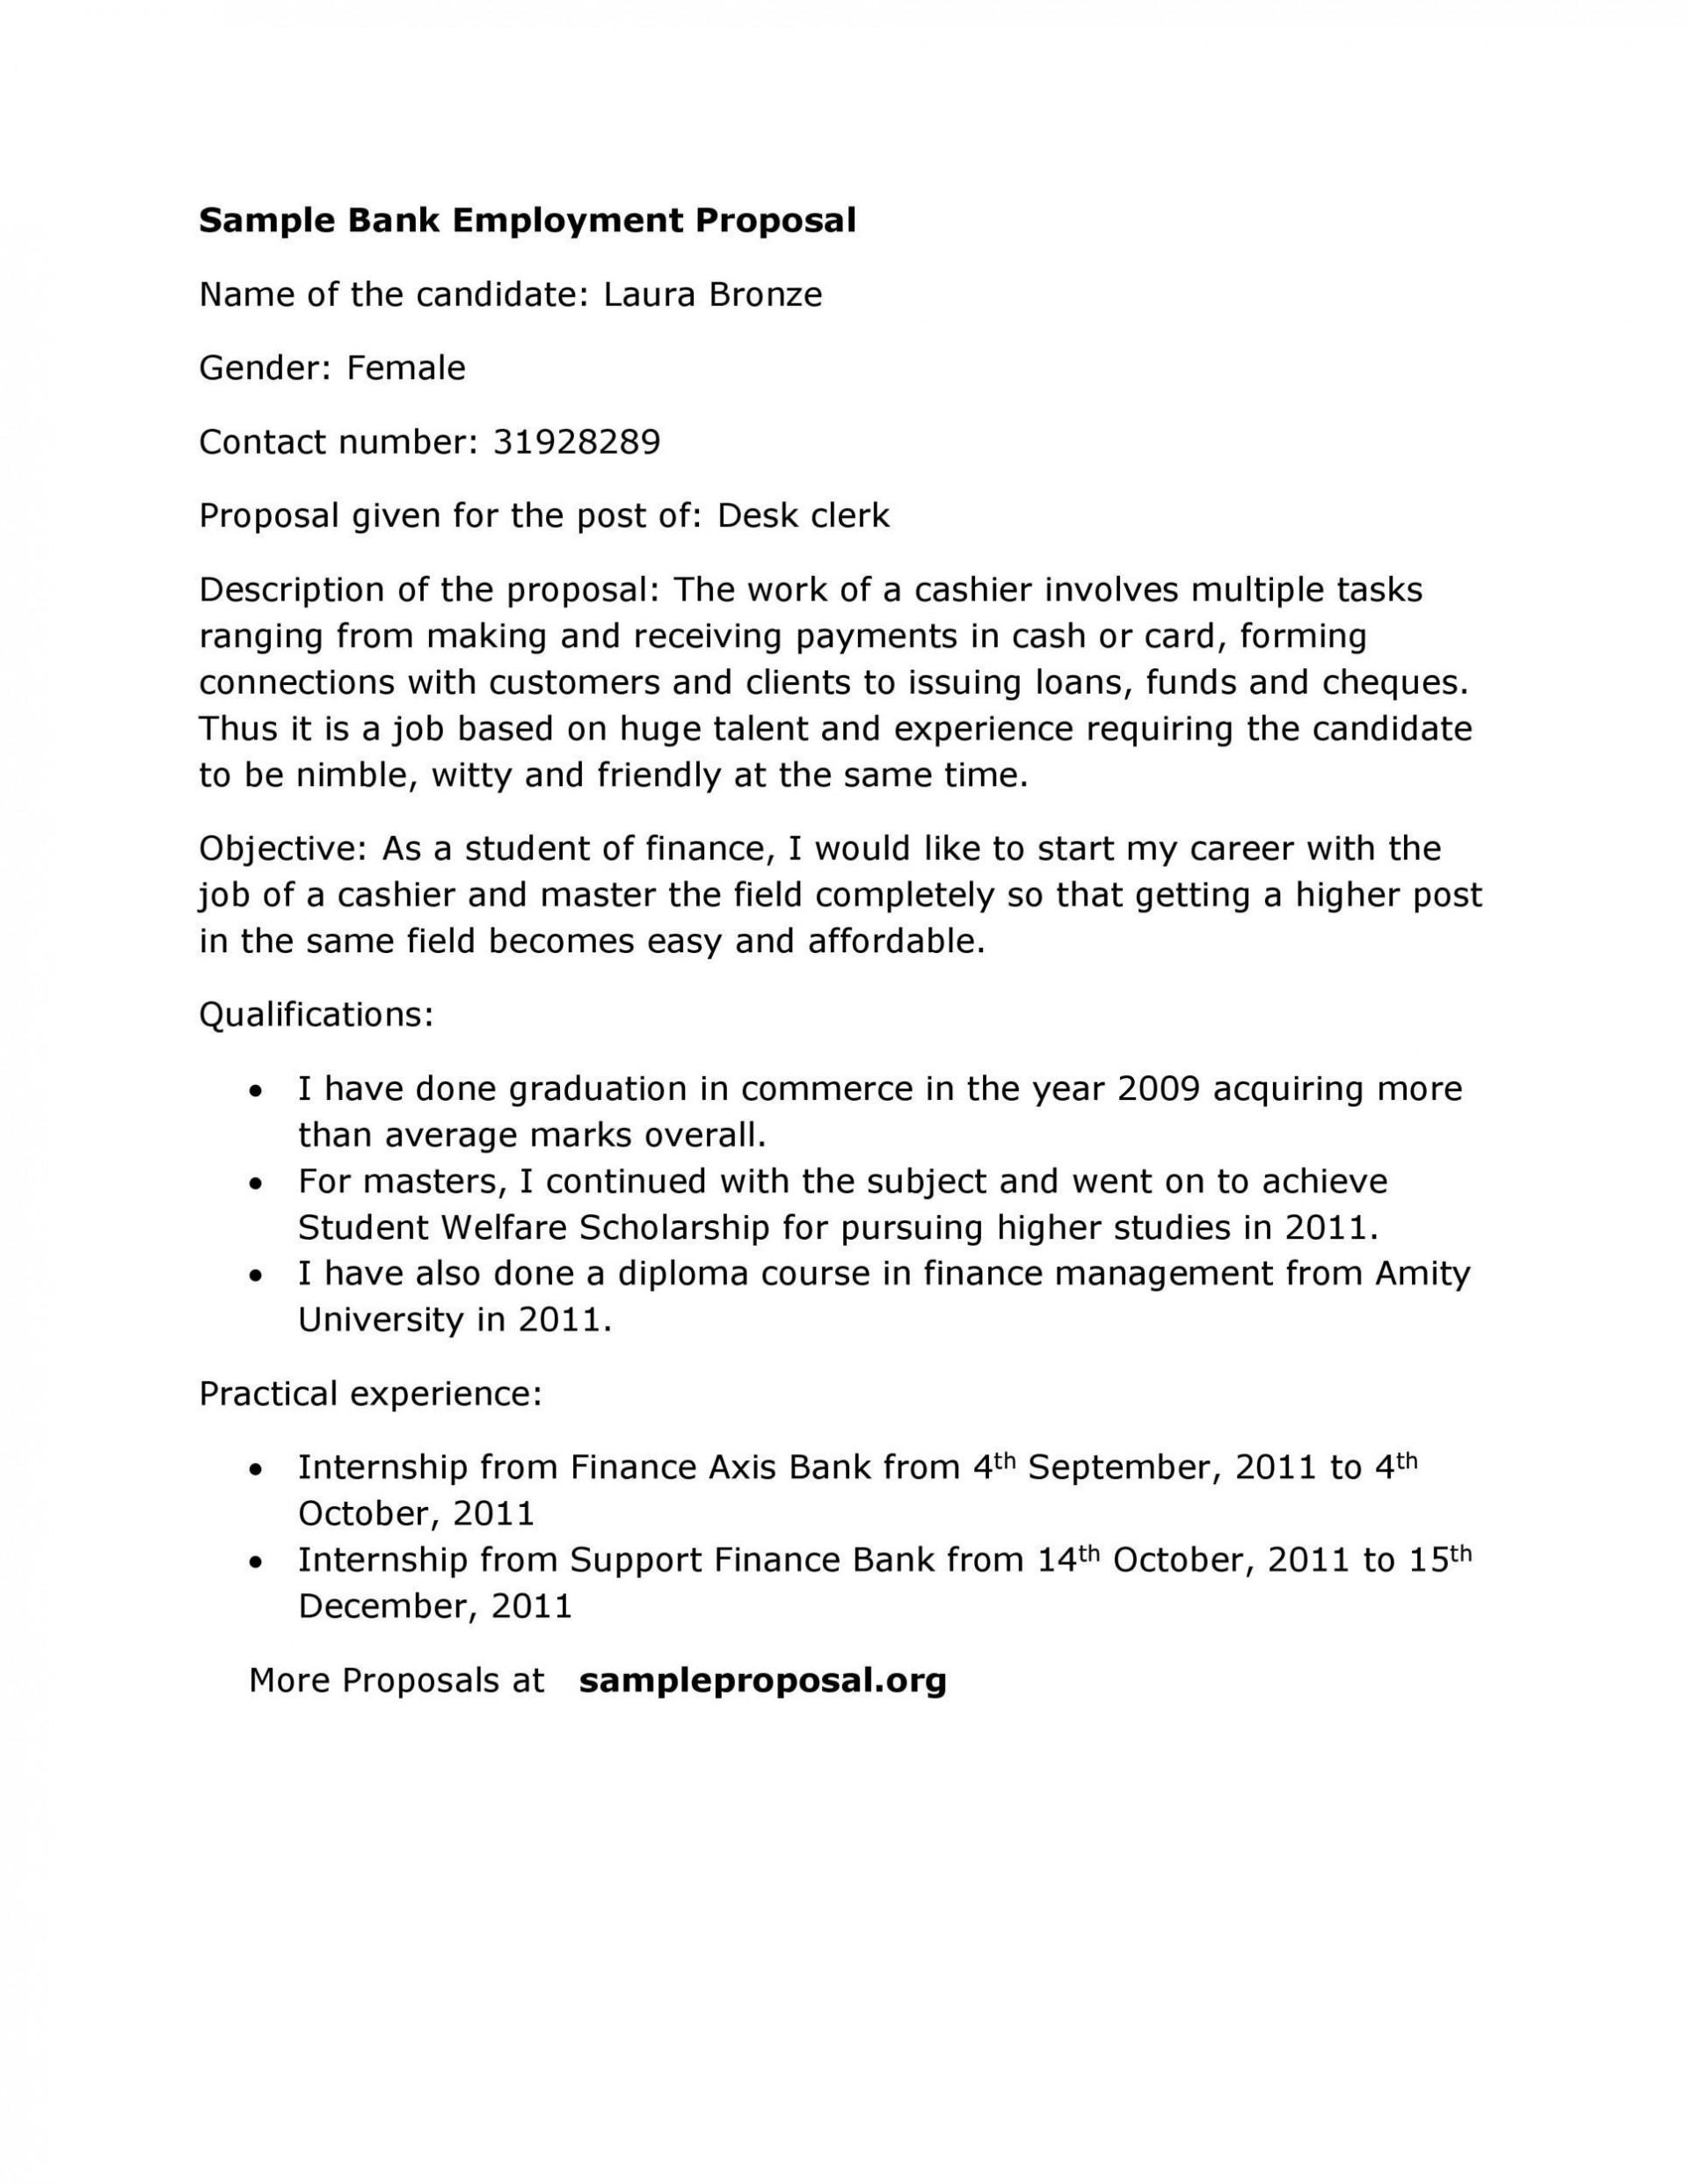 005 Surprising Writing A Job Proposal Template Sample Concept 1920